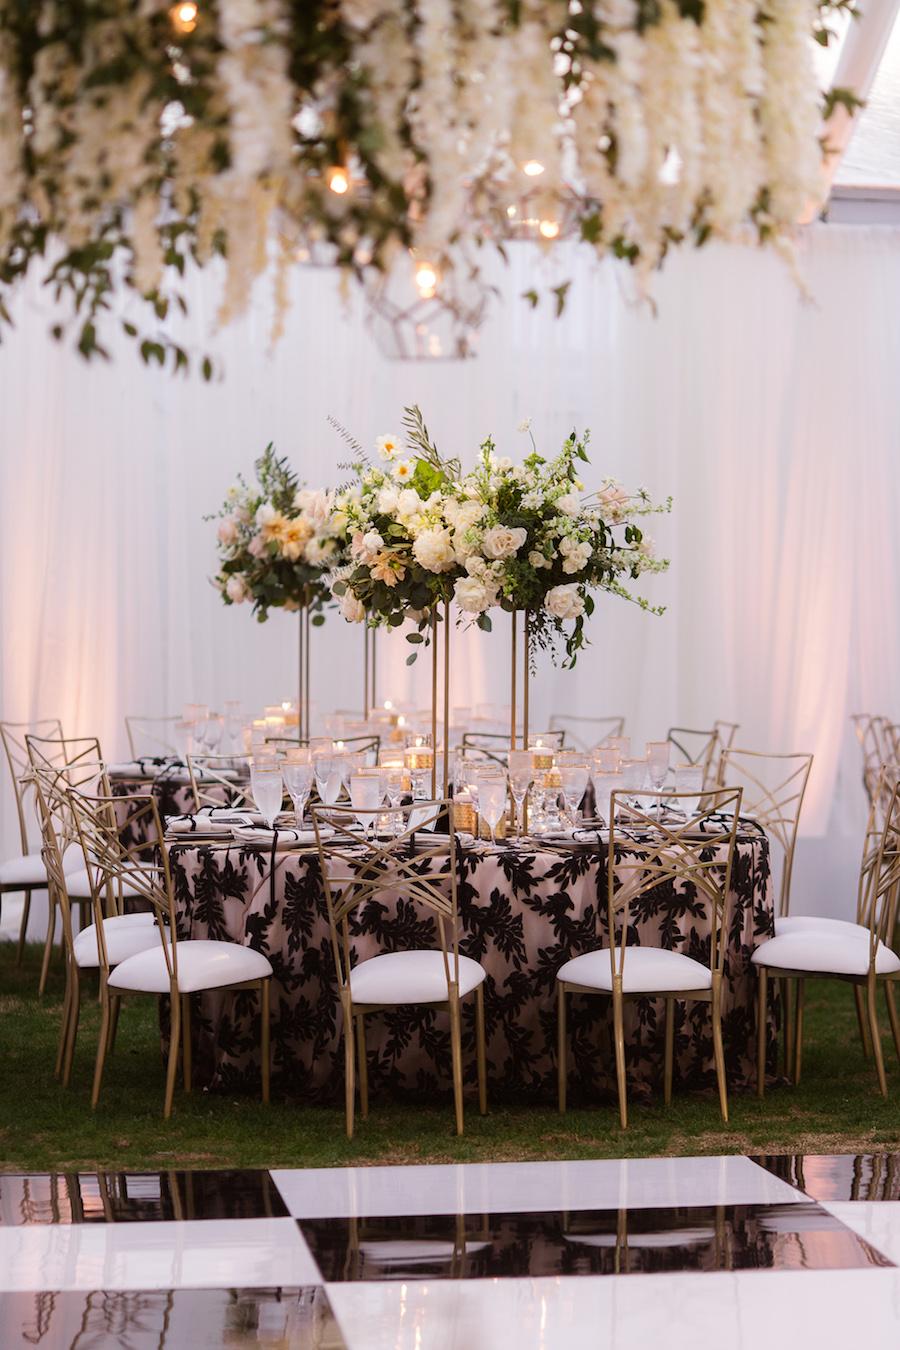 Glamorous Rancho Valencia Wedding Featured in Novelty Bride Magazine